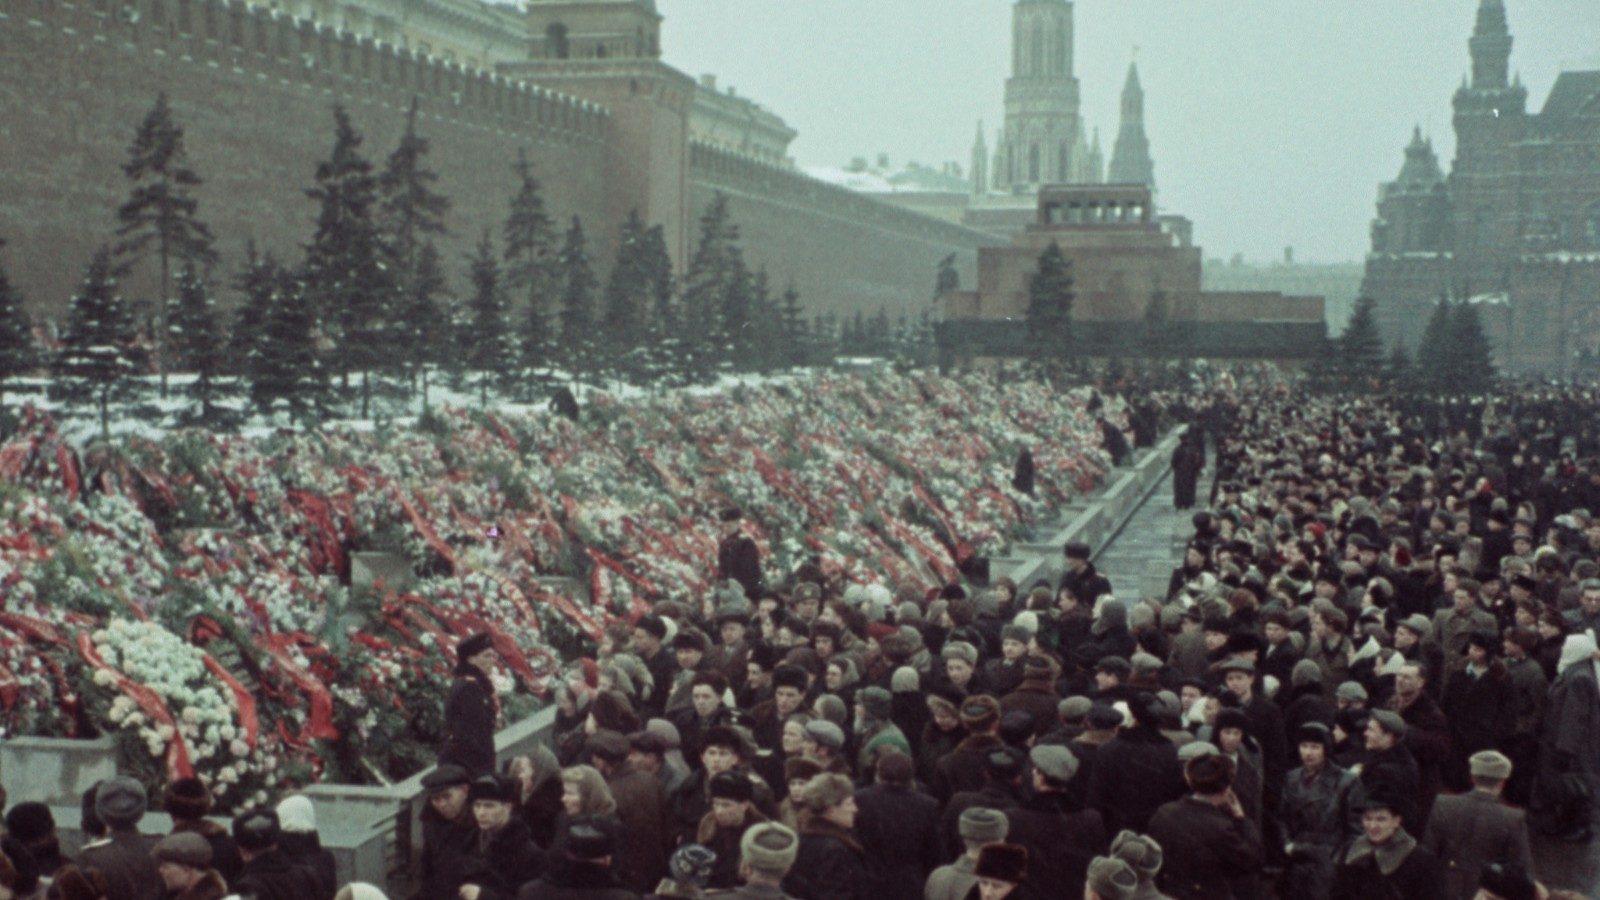 Festival de Mar del Plata 2019: crítica de «State Funeral», de Sergei Loznitsa